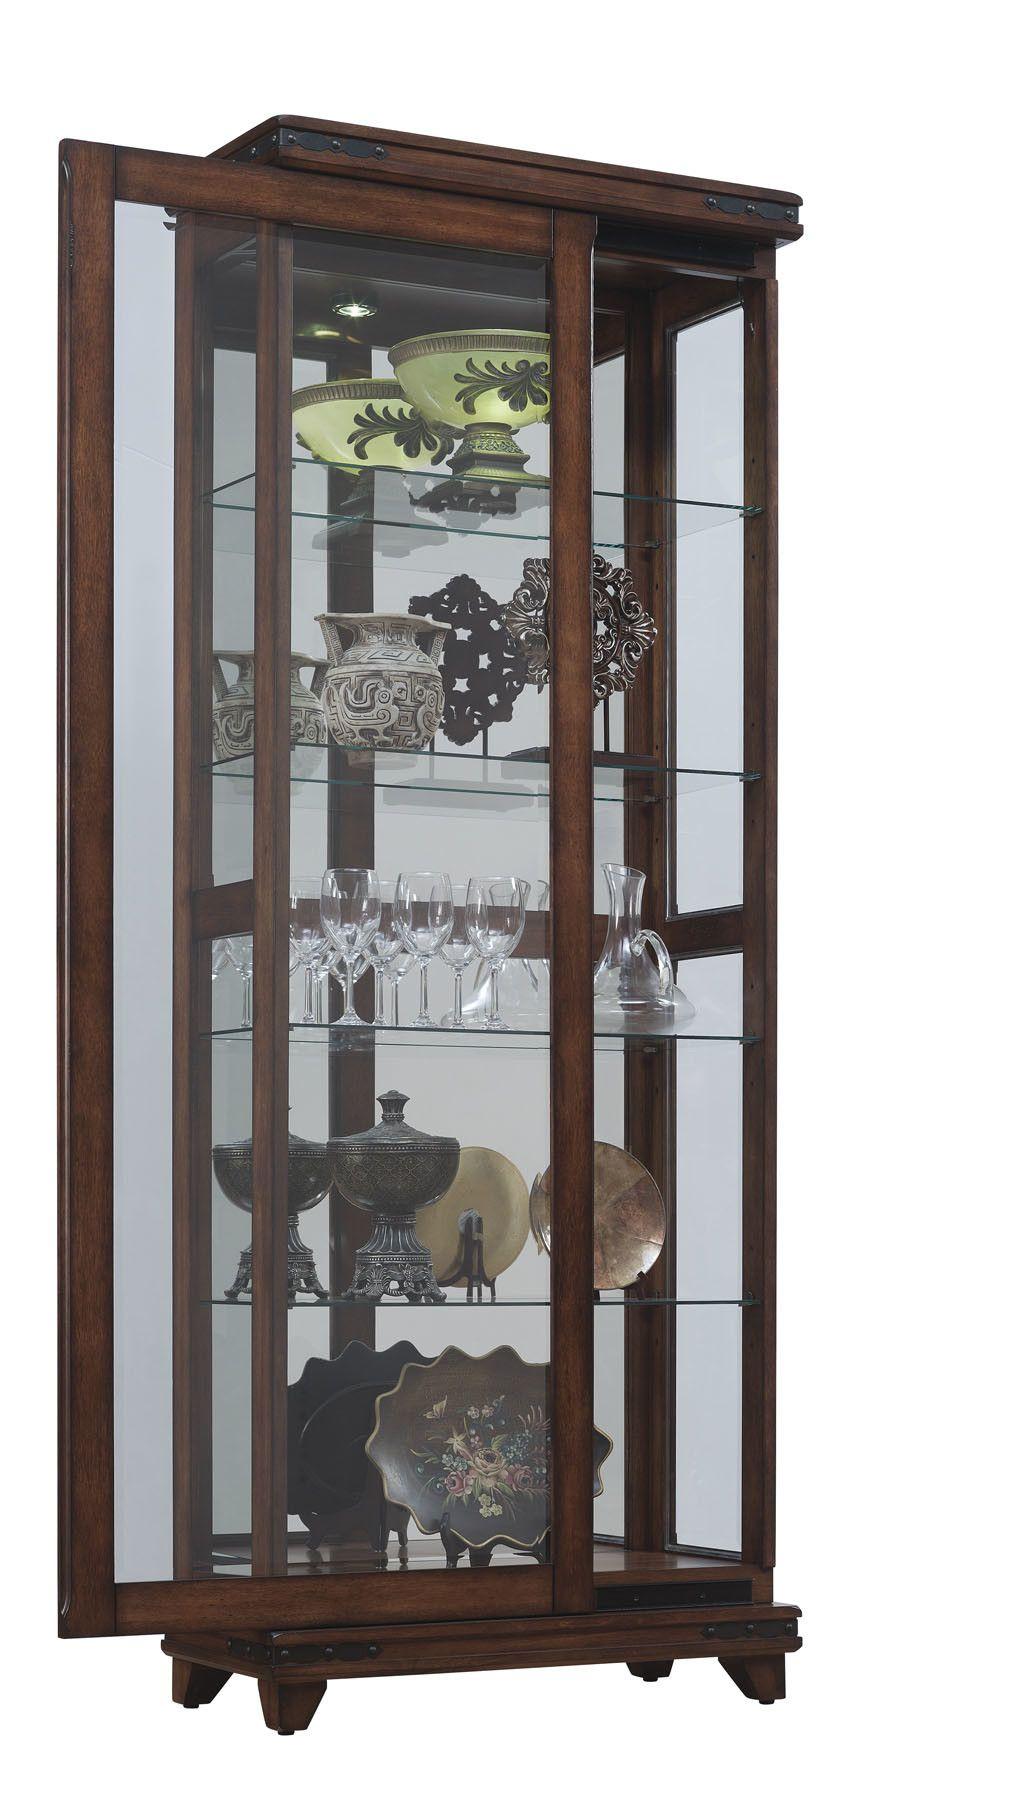 Tresanti Mayfield Curio Cabinet White Kitchen Chairs Curio Cabinet Furniture Design Modern